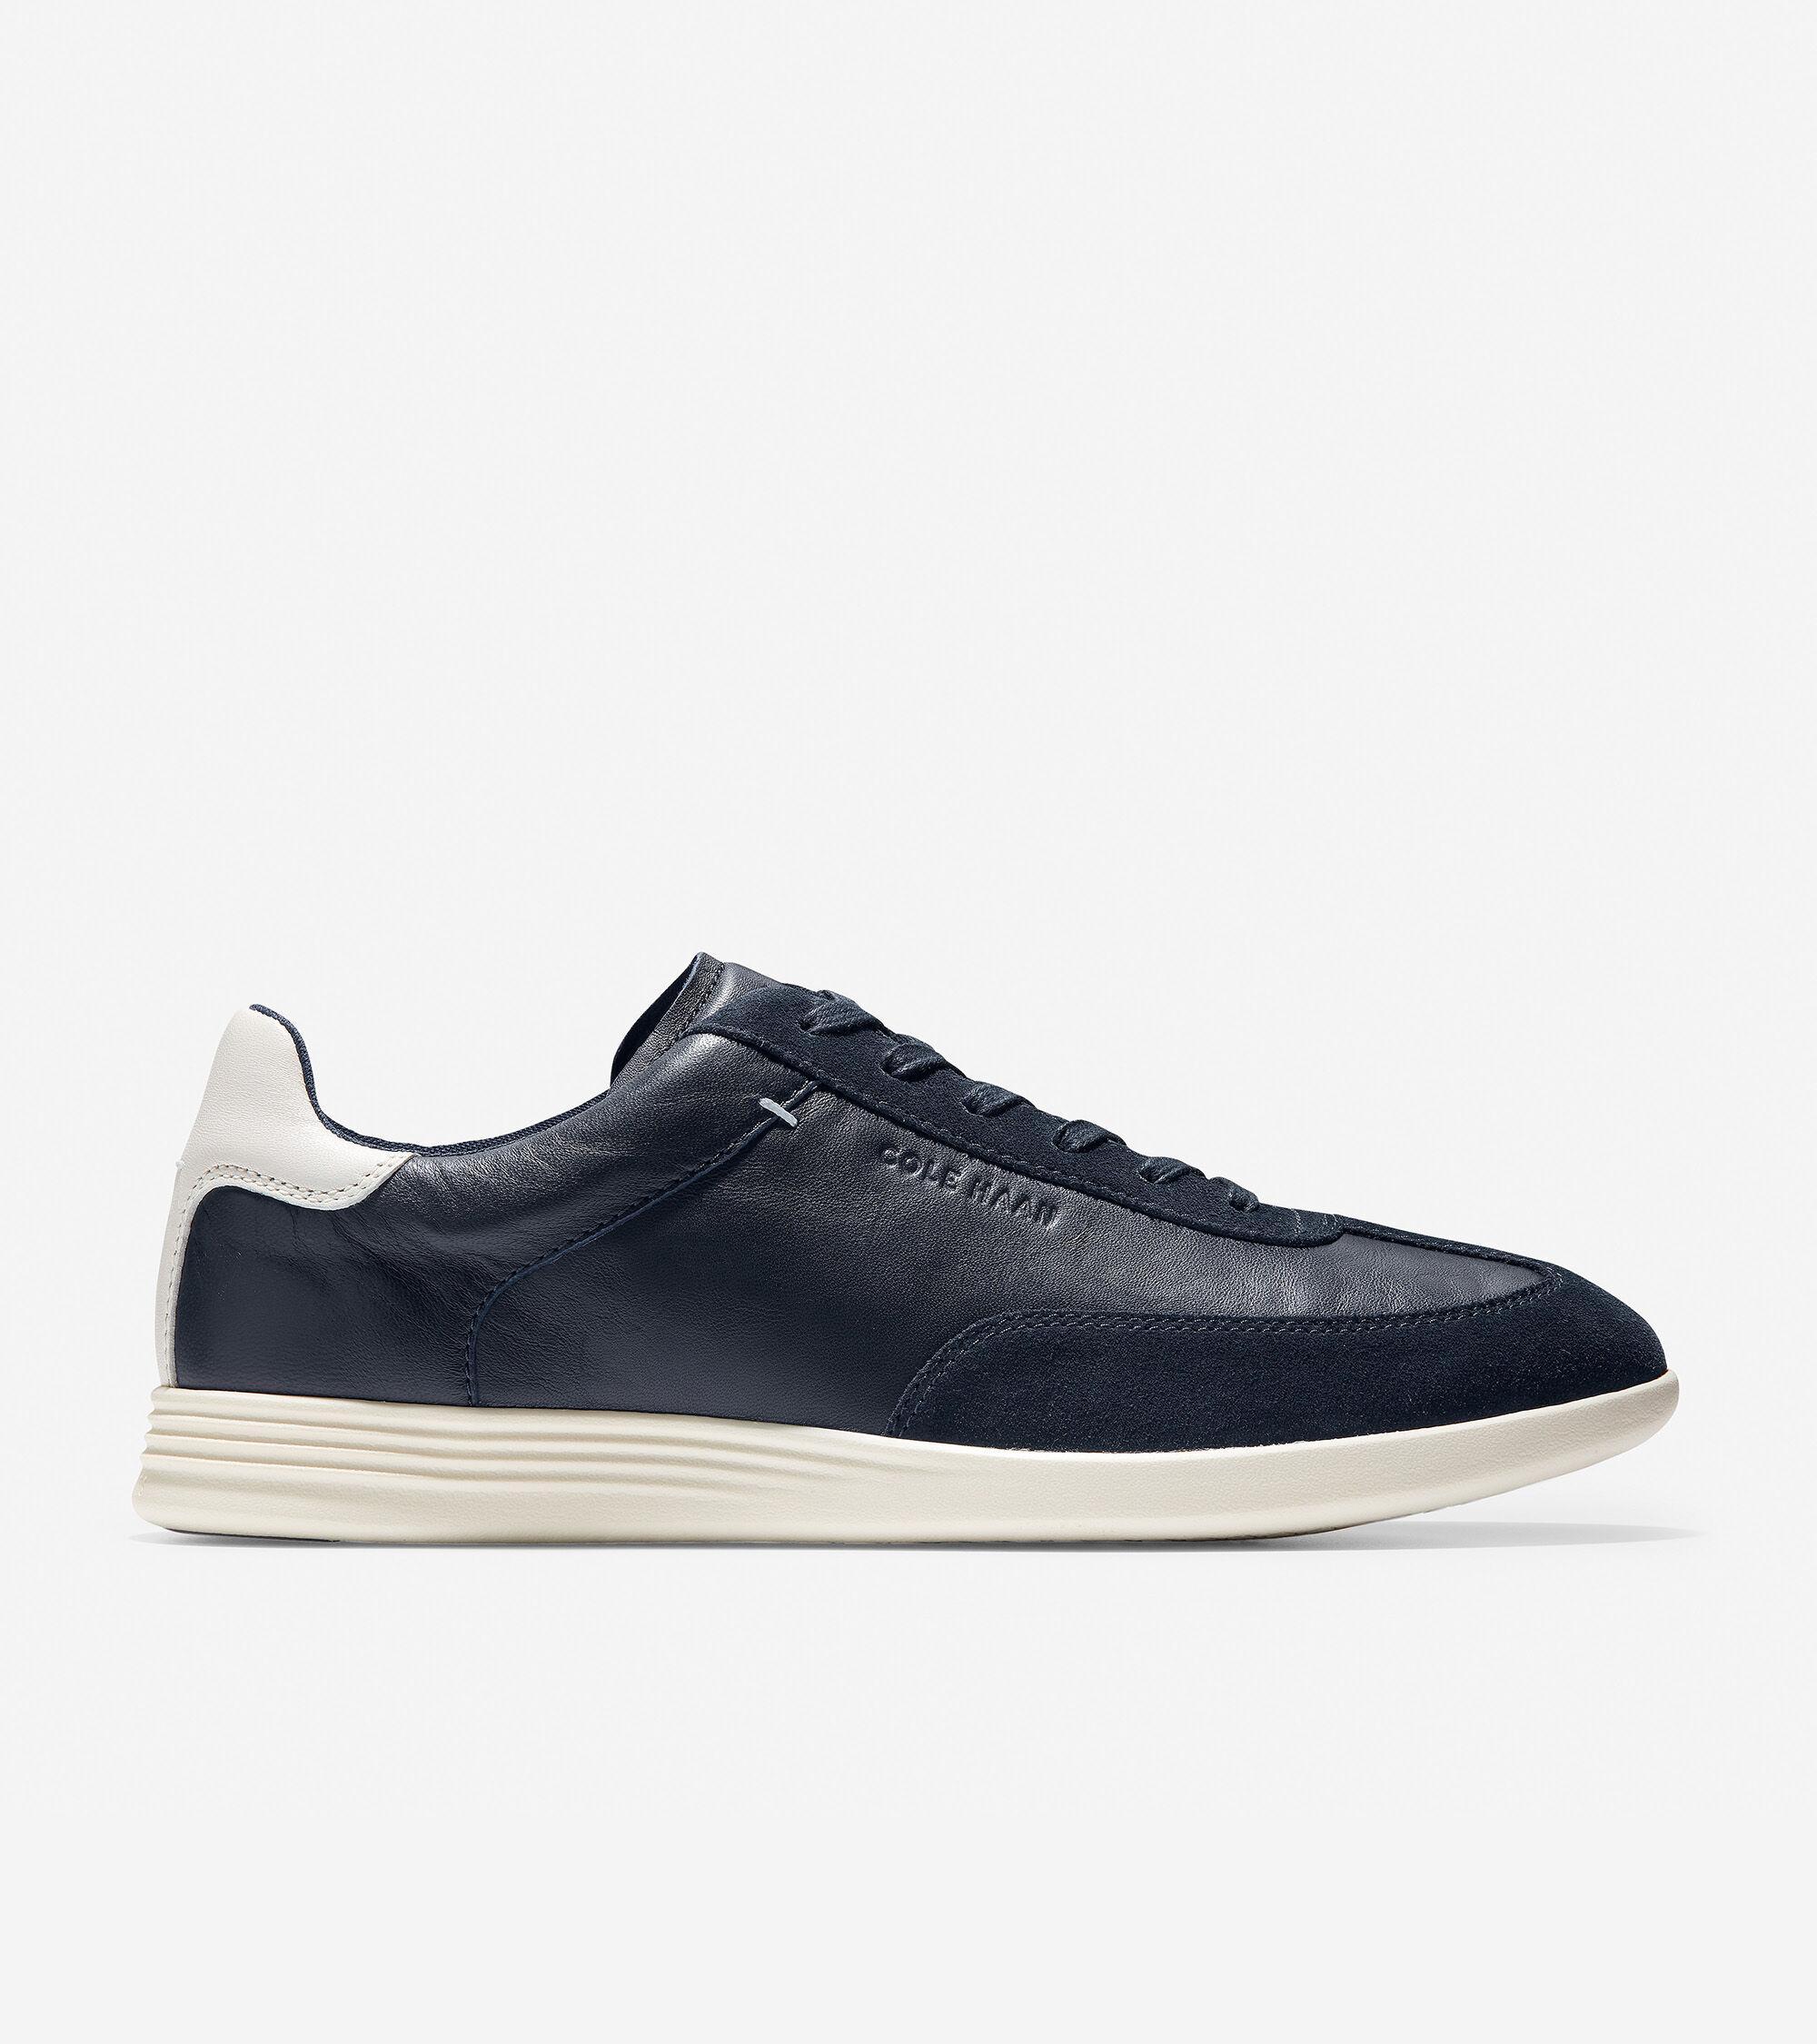 Men's Grand Crosscourt Turf Sneaker in